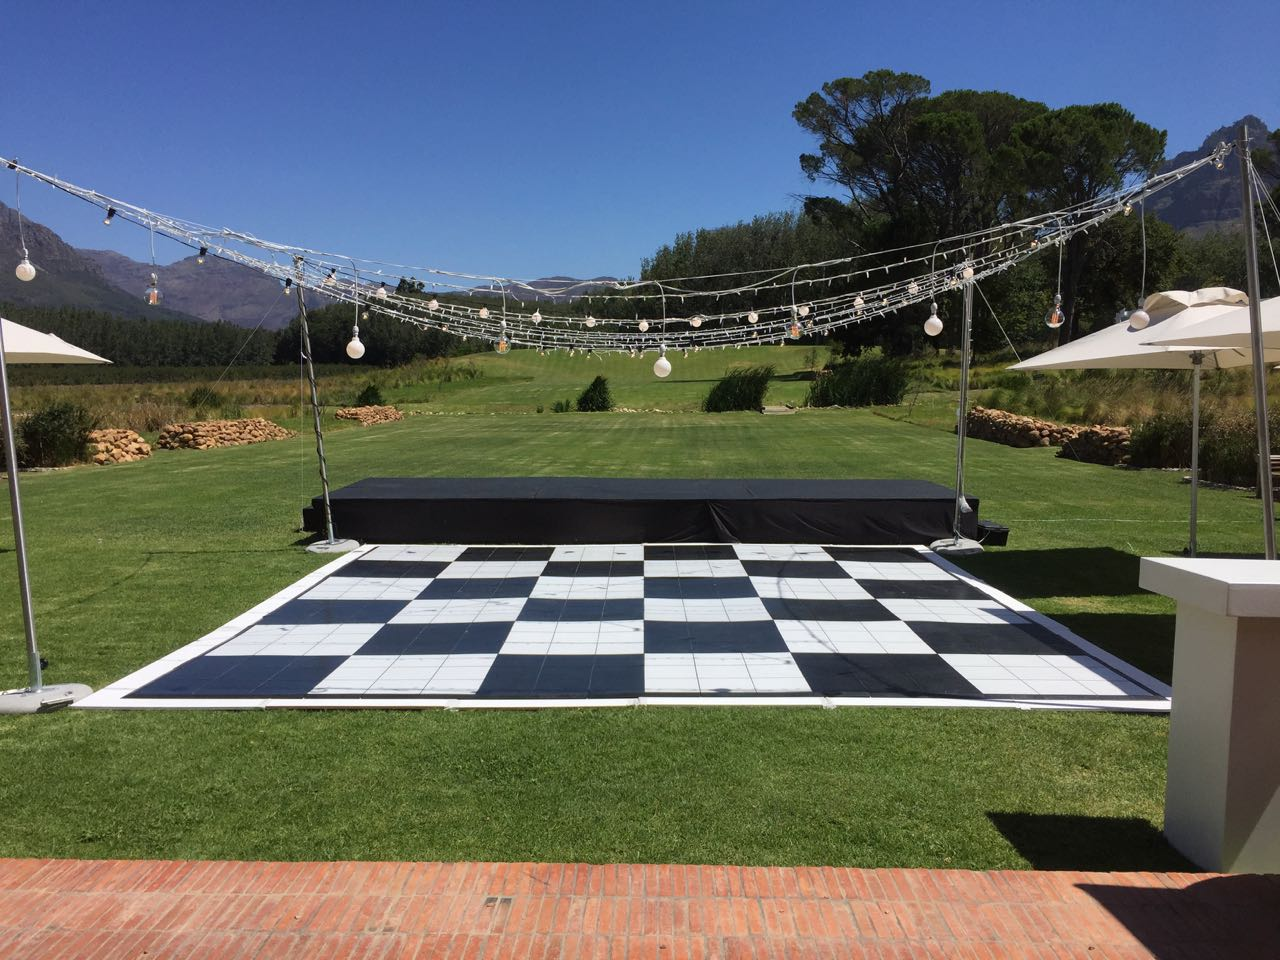 Checkered tiled dance floor with upderfloor